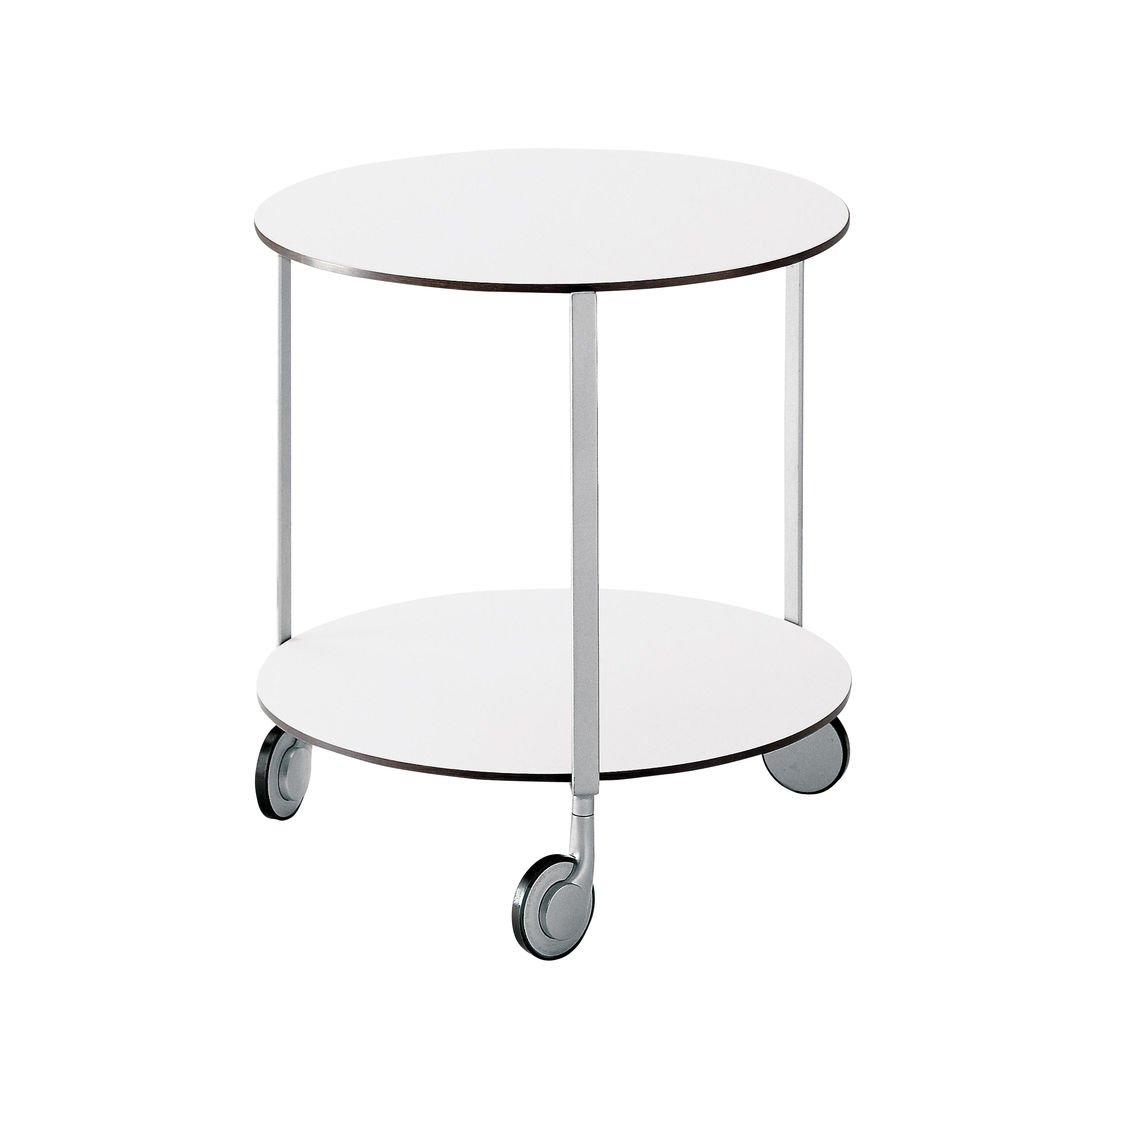 Zanotta gir mesa auxiliar con ruedas ambientedirect - Mesa auxiliar con ruedas ...